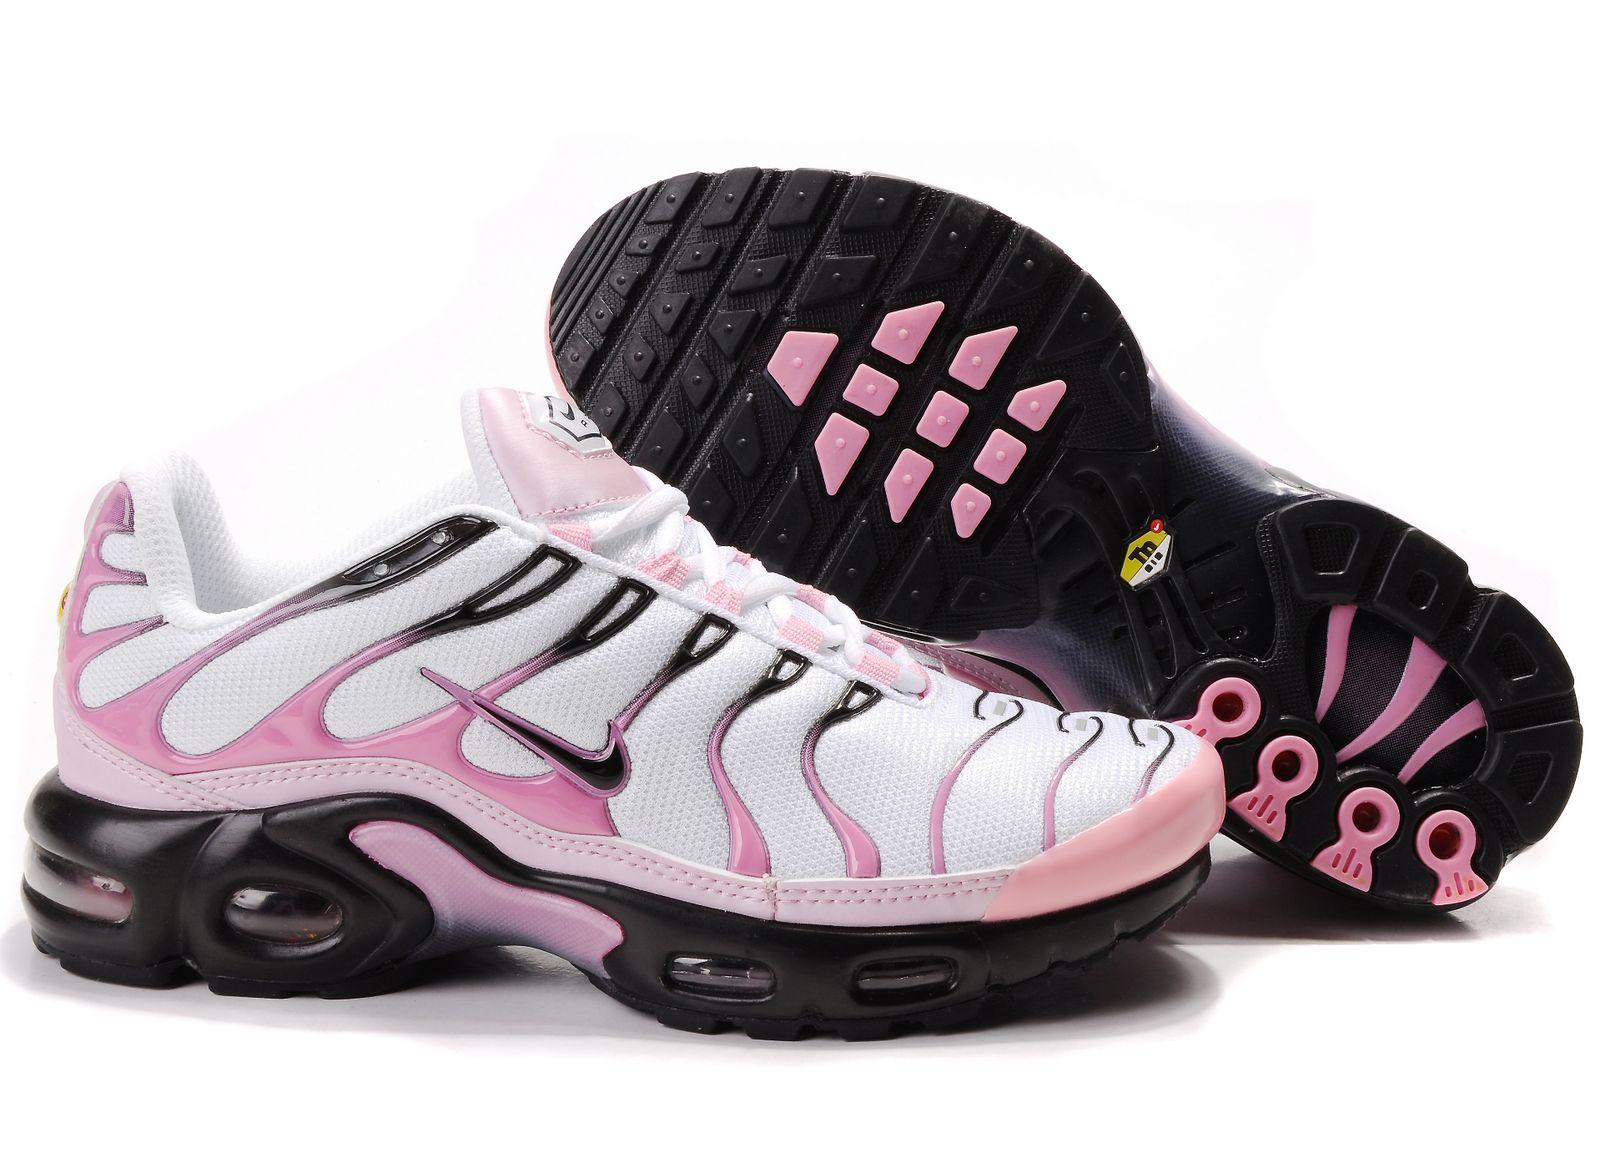 online store 052da 88739 basket air max femme nike tn PTK wFKlb